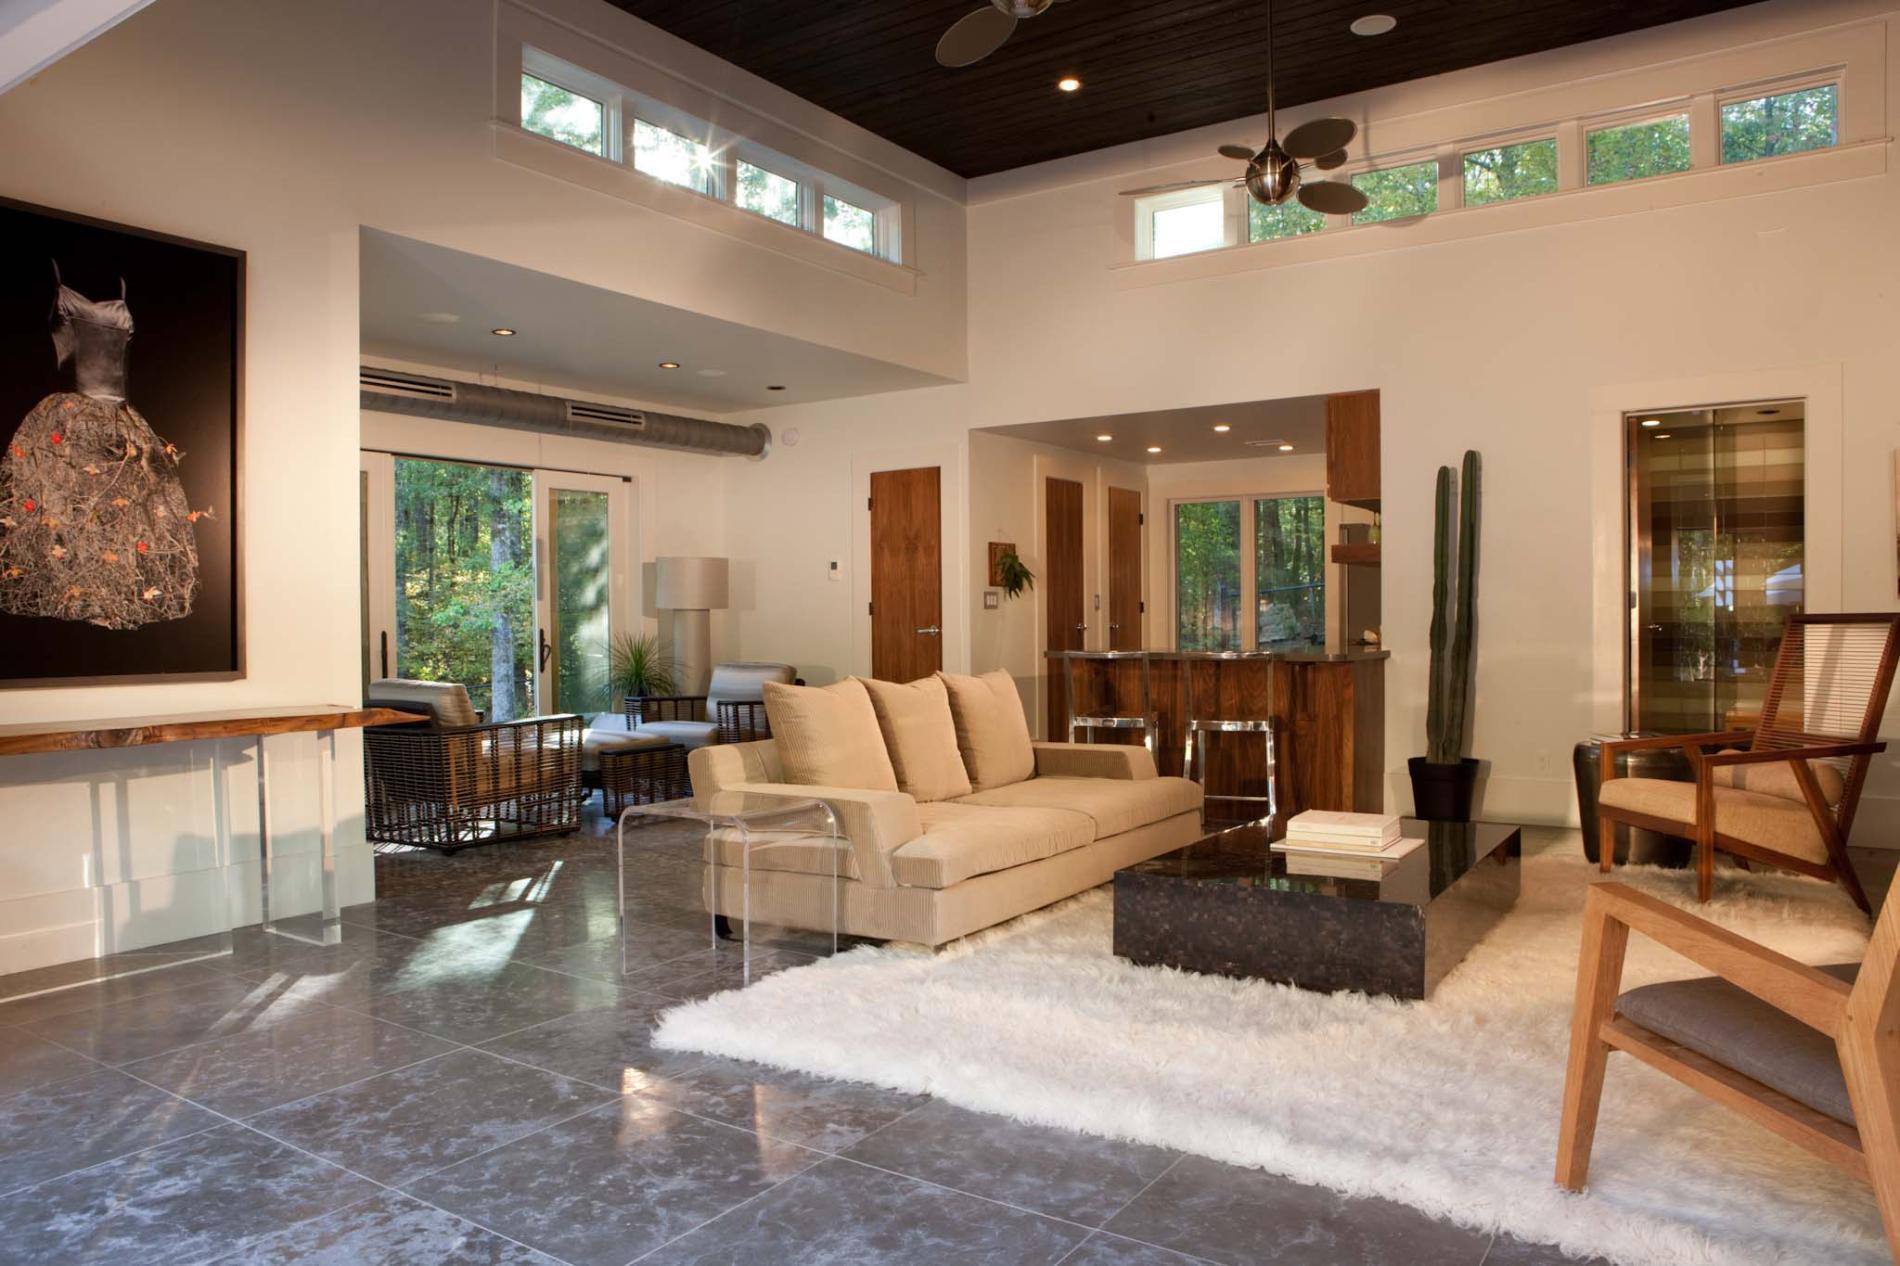 Ordinaire Pool House Inside. \ Pool House Inside F